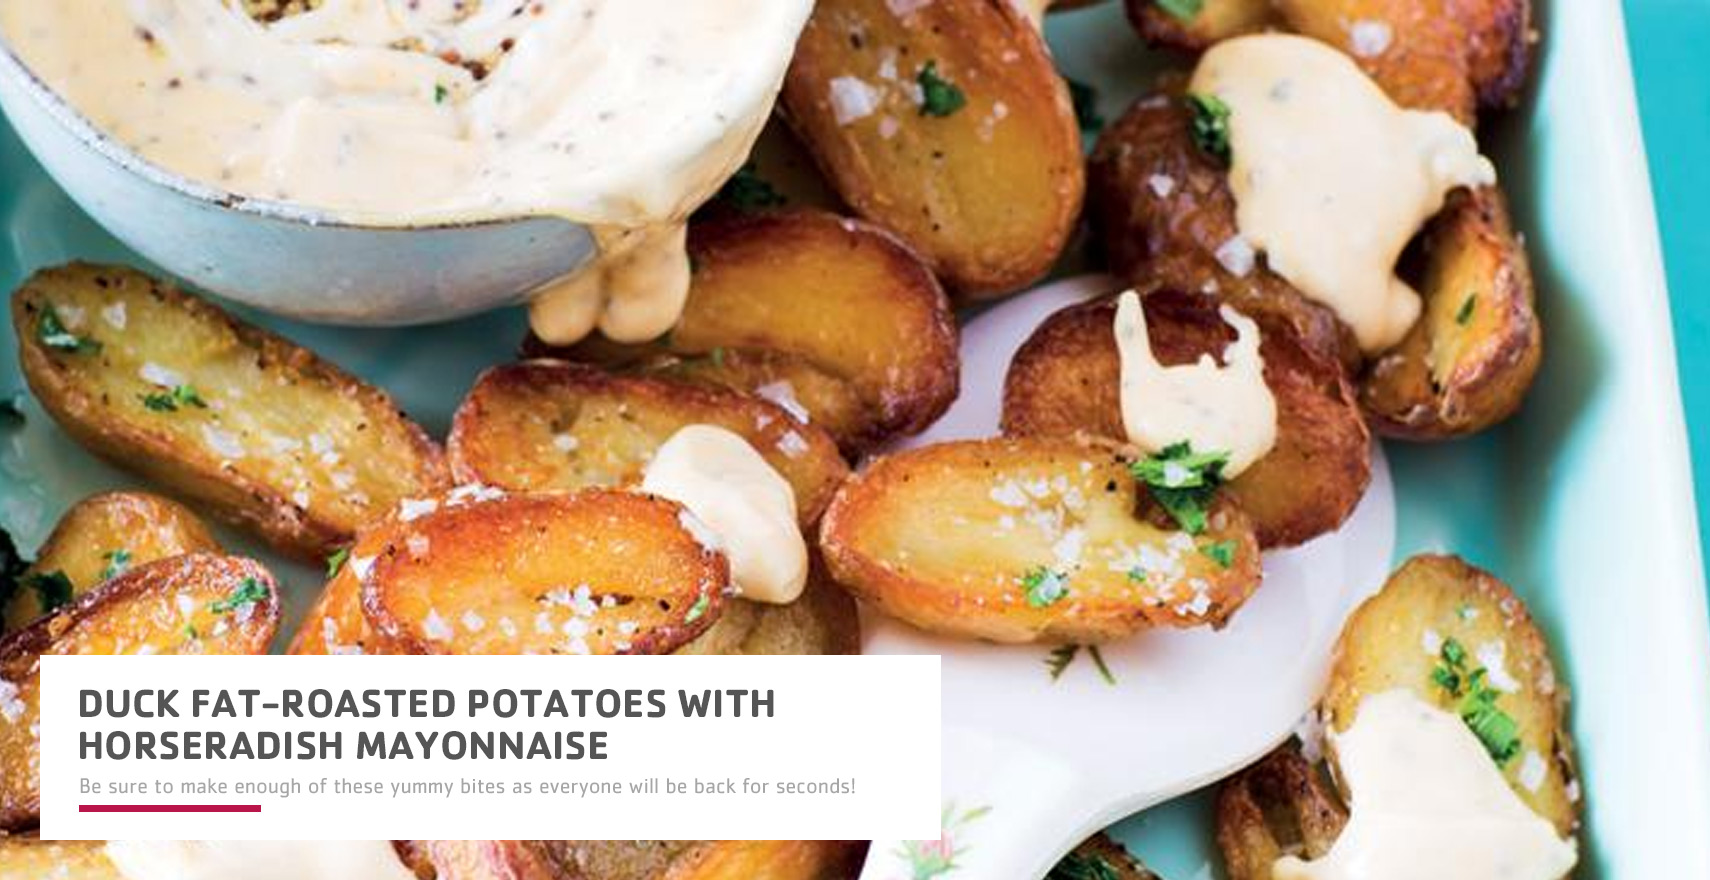 duckfat-roast-potatoes-with-horseradish-mayonnaise.jpg